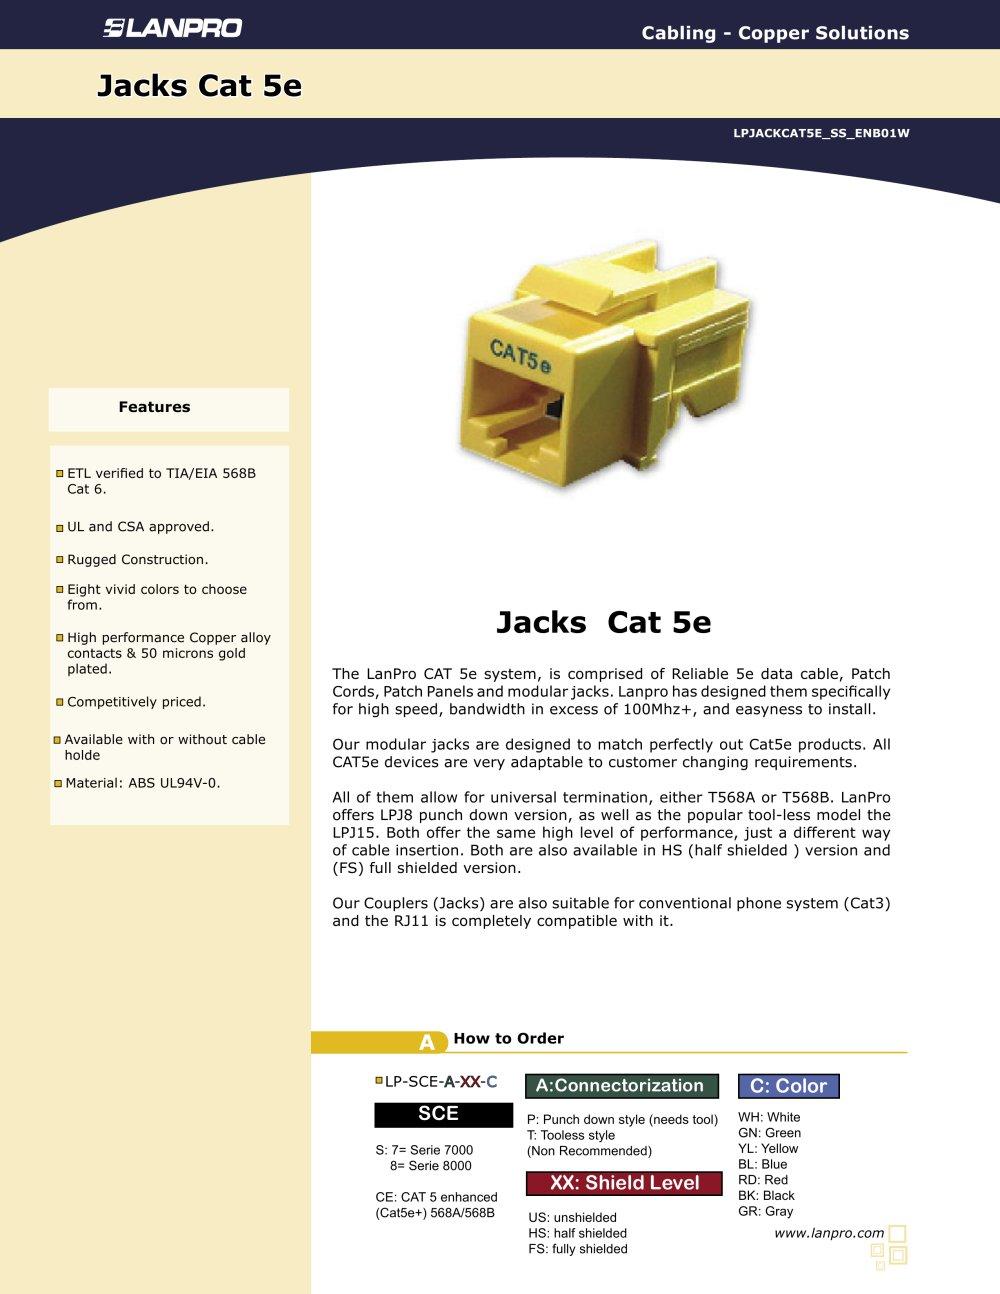 medium resolution of lpjackcat5e ss enb01w modular jacks cat 5e 1 1 pages